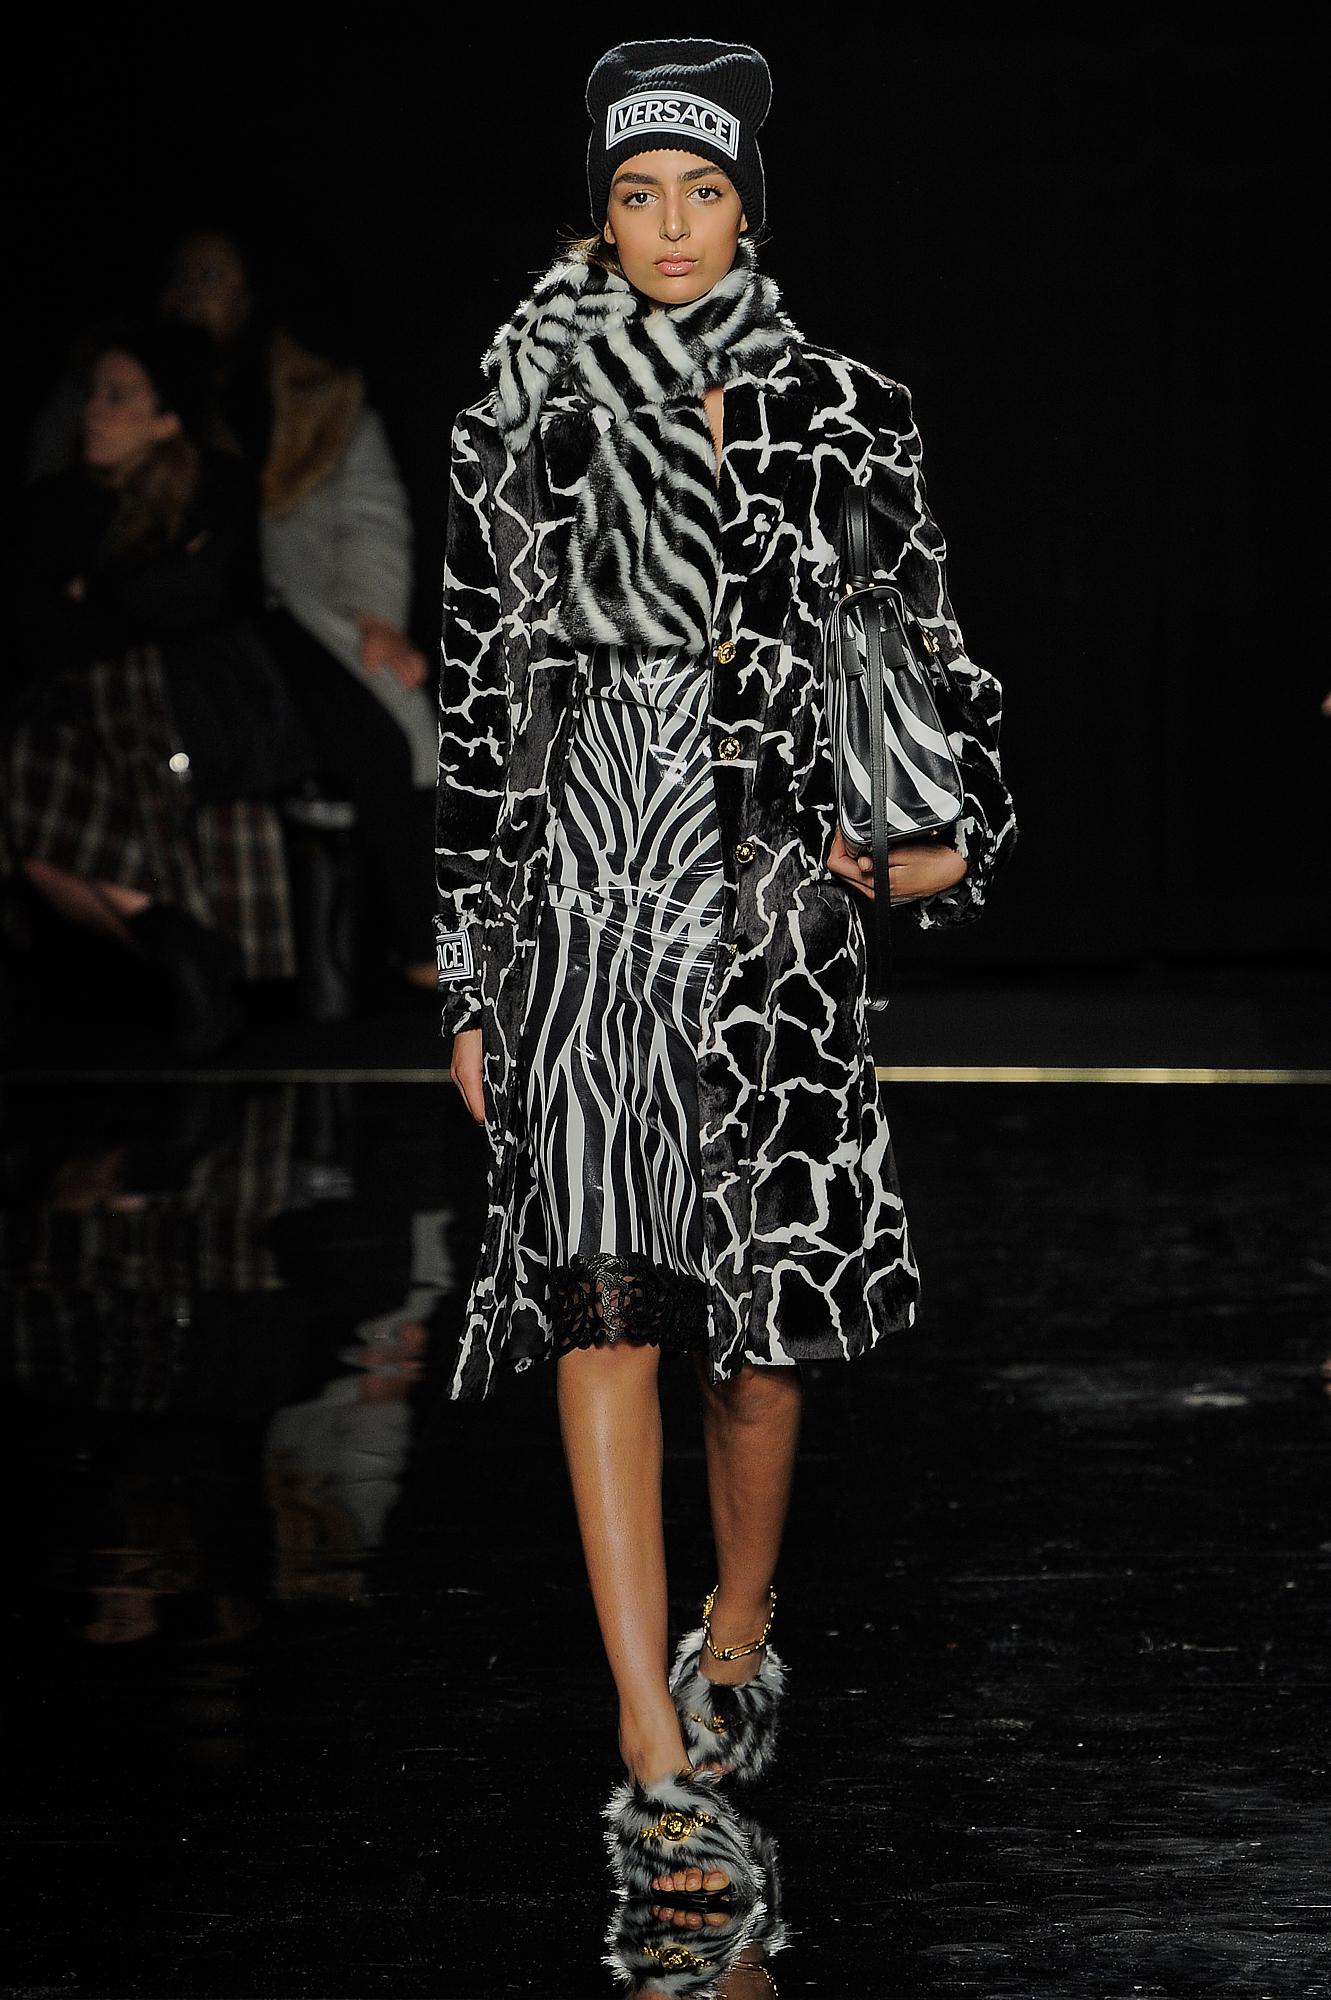 Versace_20_3d_versace_runway_runway_00020.jpg